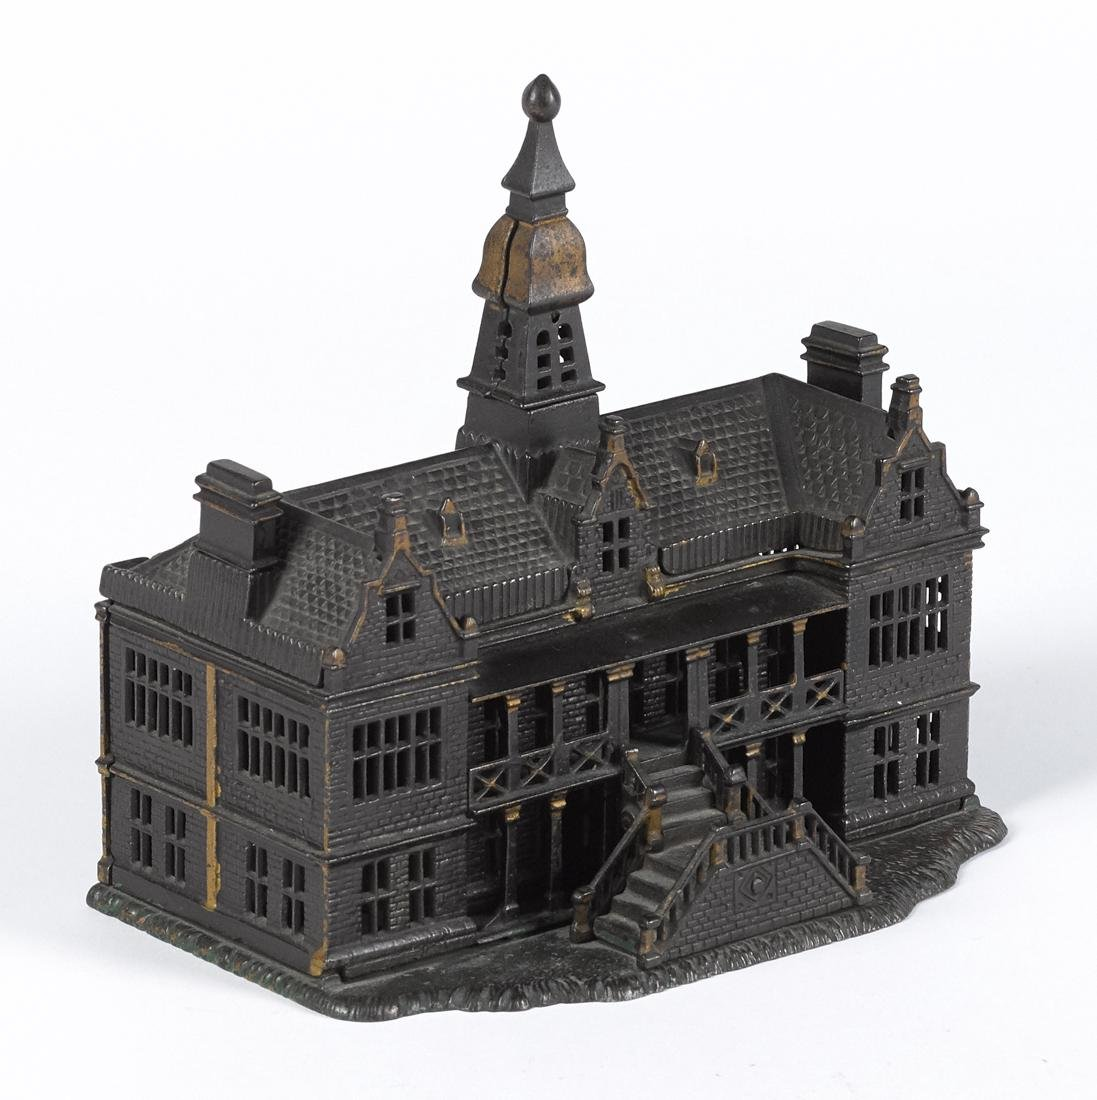 Ives cast iron palace still bank, 7 3/4'' h.